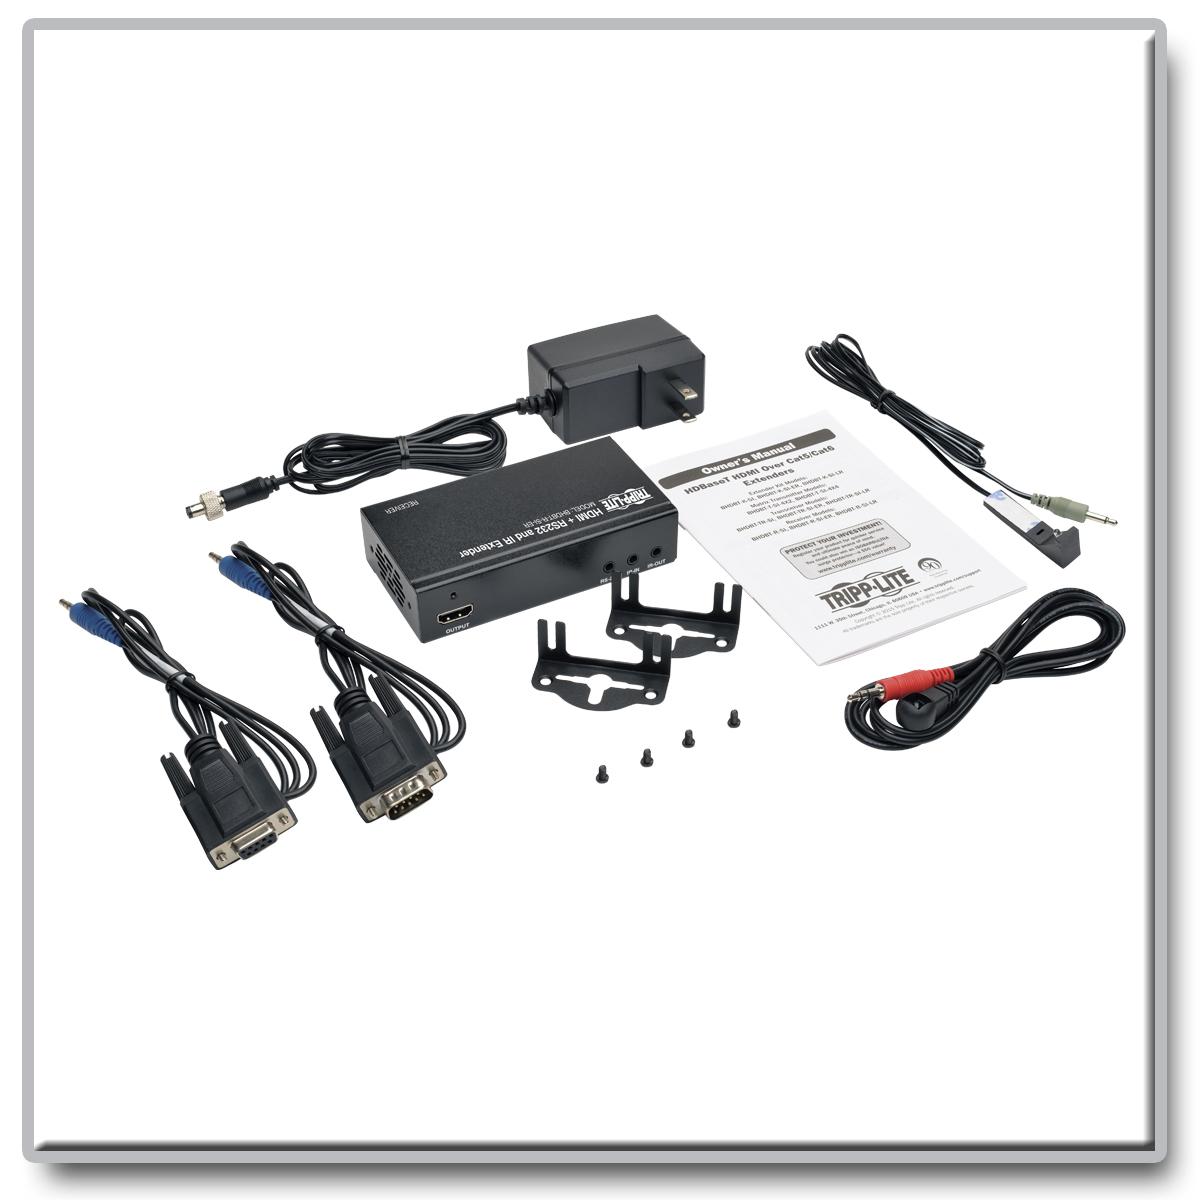 Tripp Lite Hdbaset Hdmi Over Cat5e 6 6a Extender Receiver 4k X 2k Wiring Diagram Serial And Ir Control Cat6